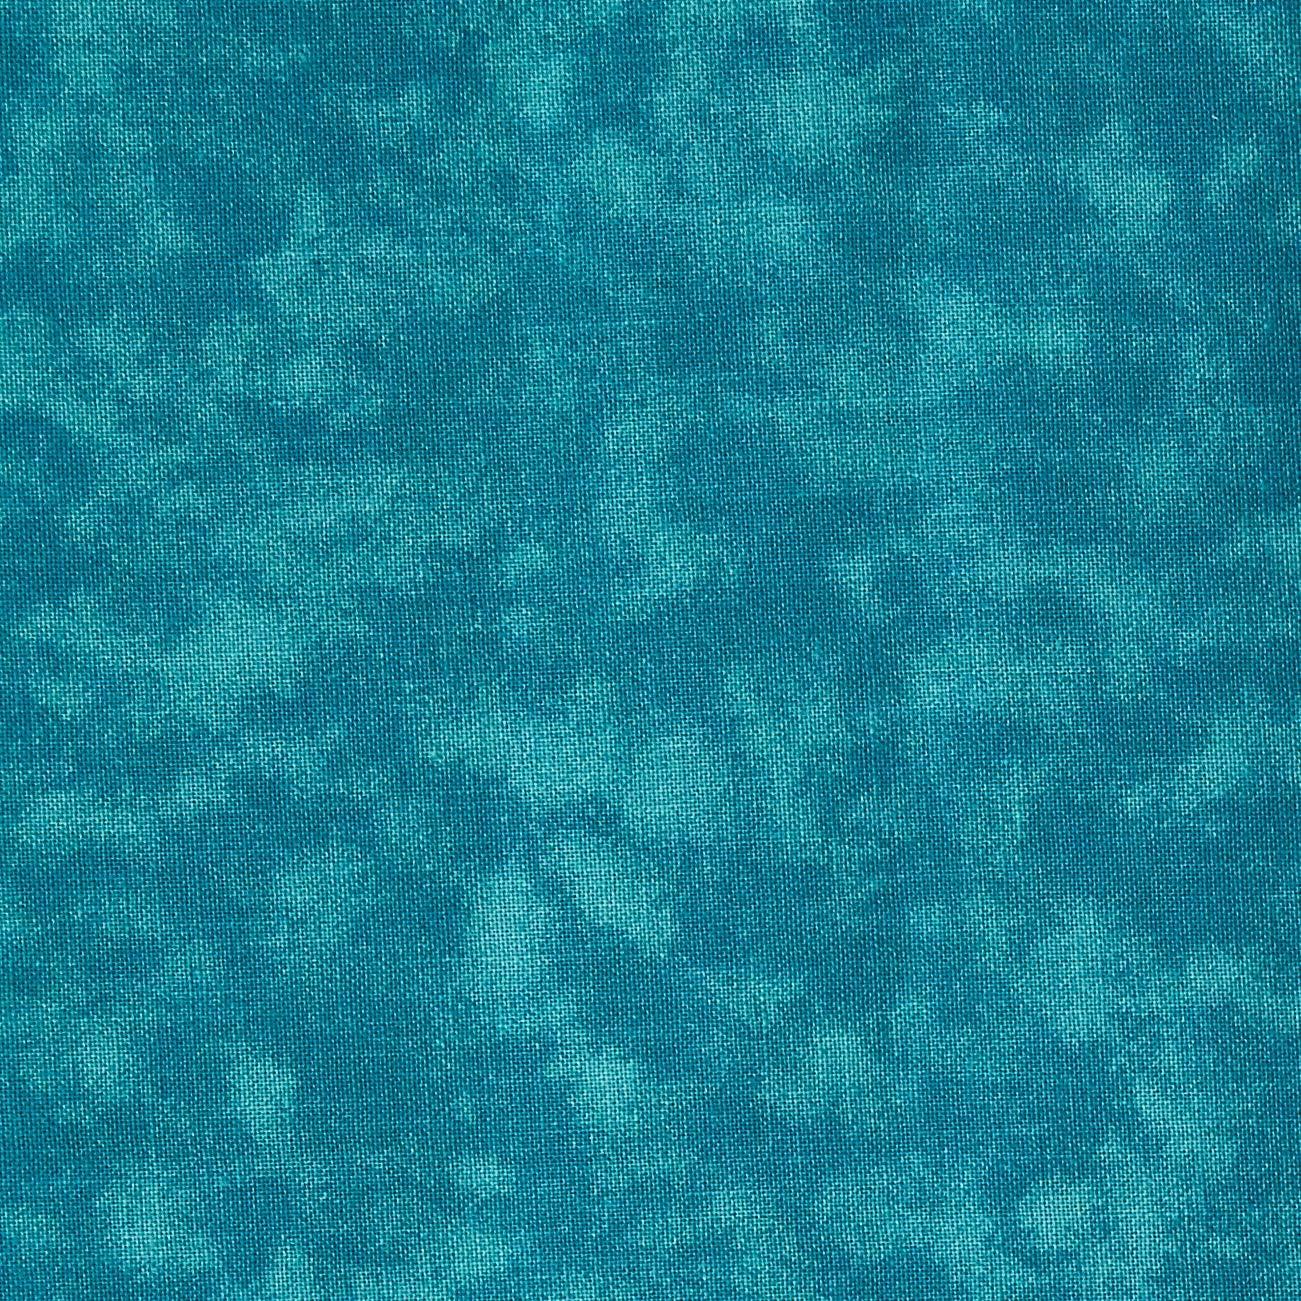 "Santee Print Works 108"" Wide Cotton Blenders Jade Fabric by the Yard"